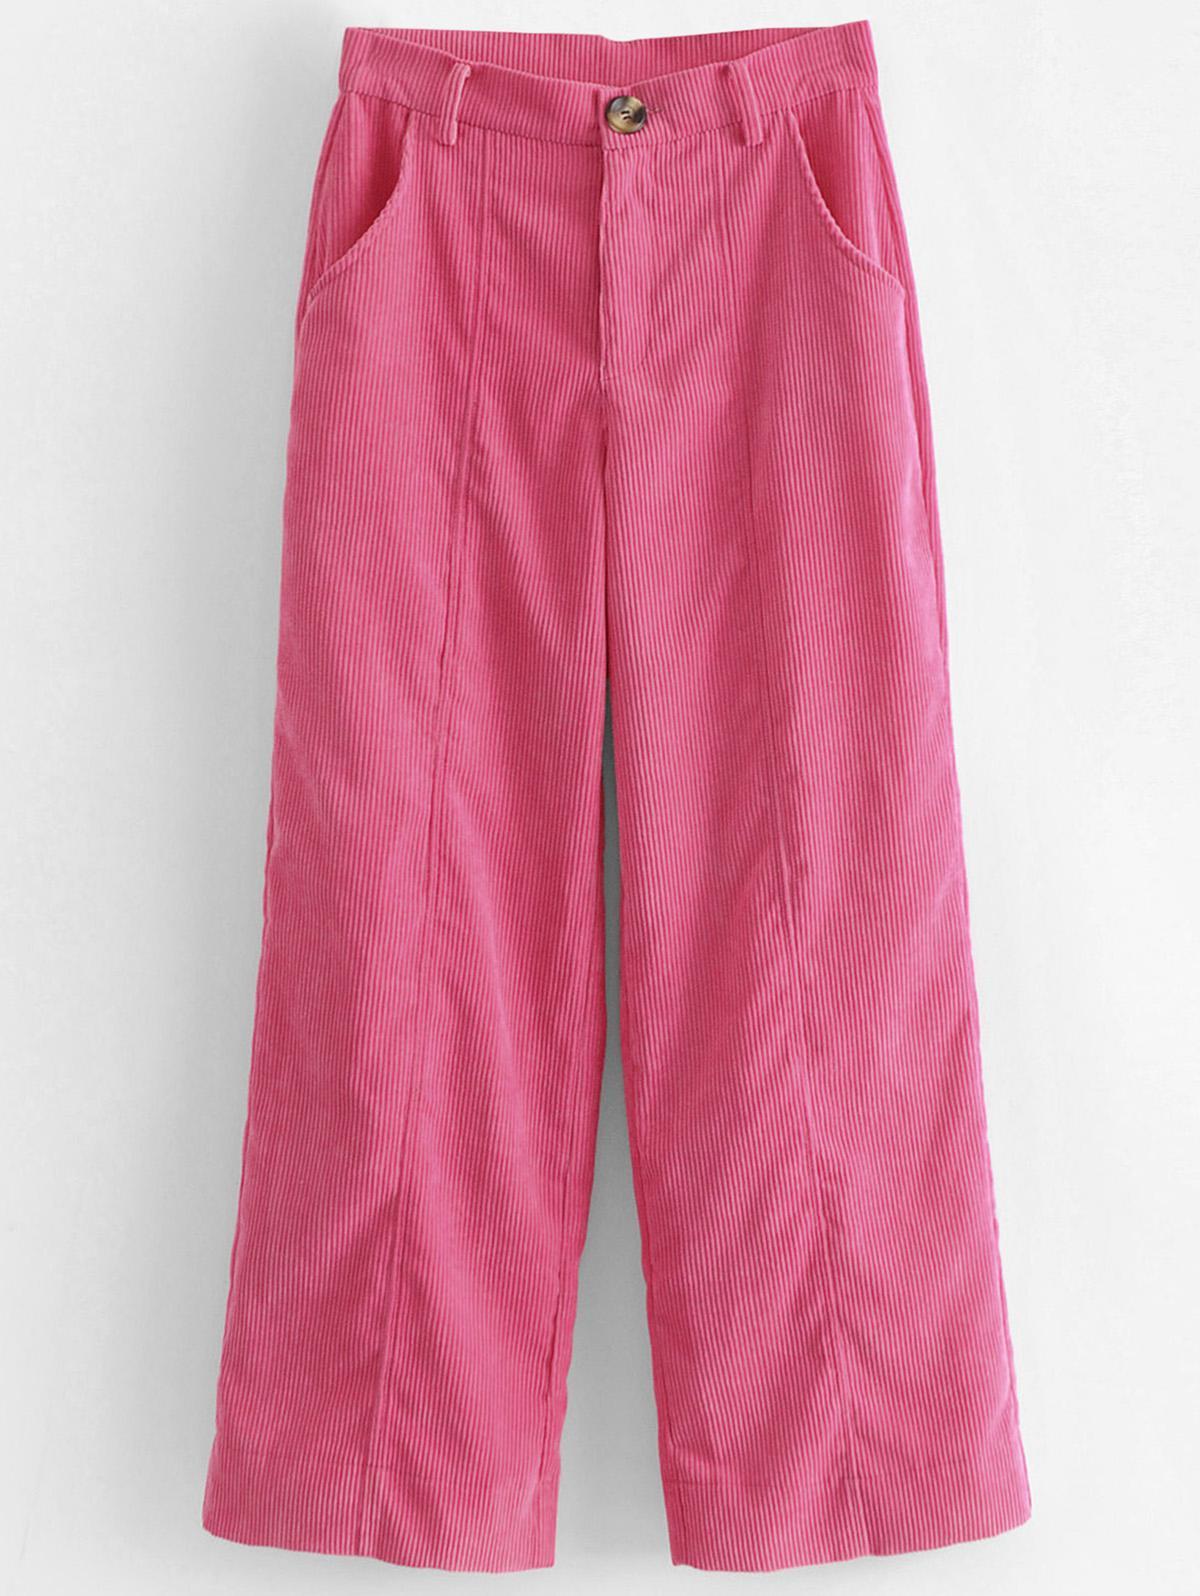 Wide Leg High Waisted Corduroy Pants, Hot pink